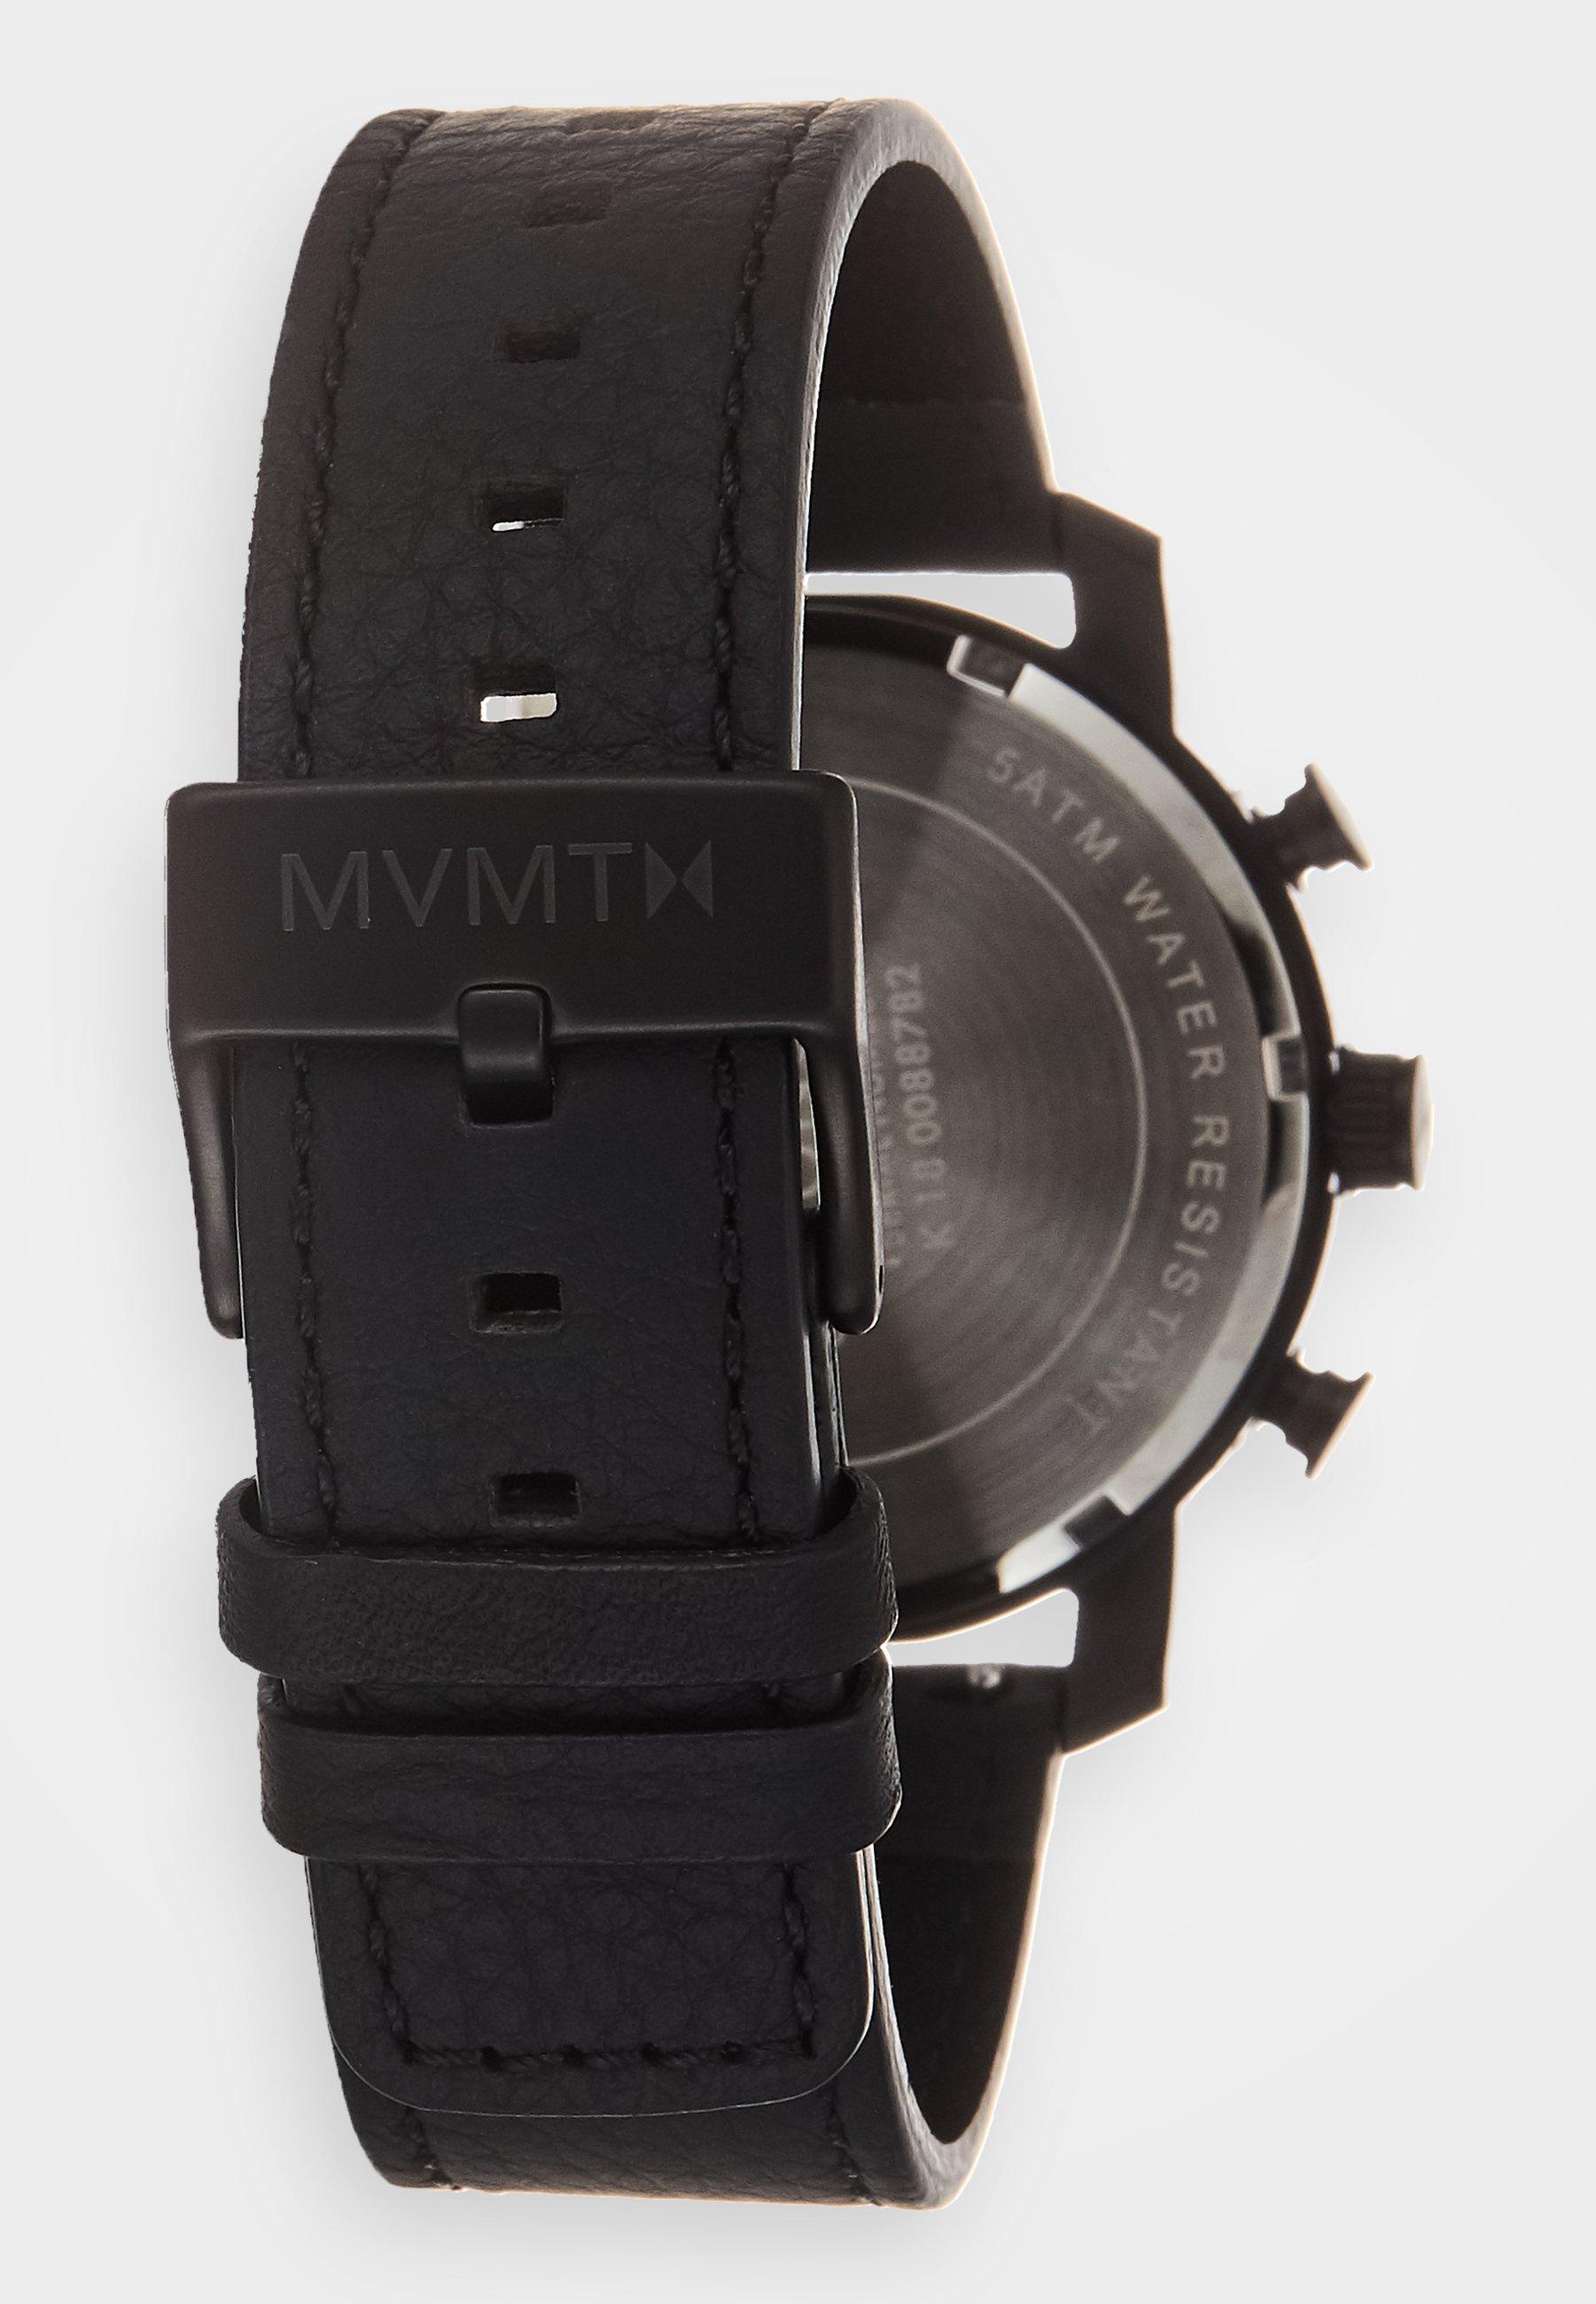 Mvmt Chronograph Watch - Black